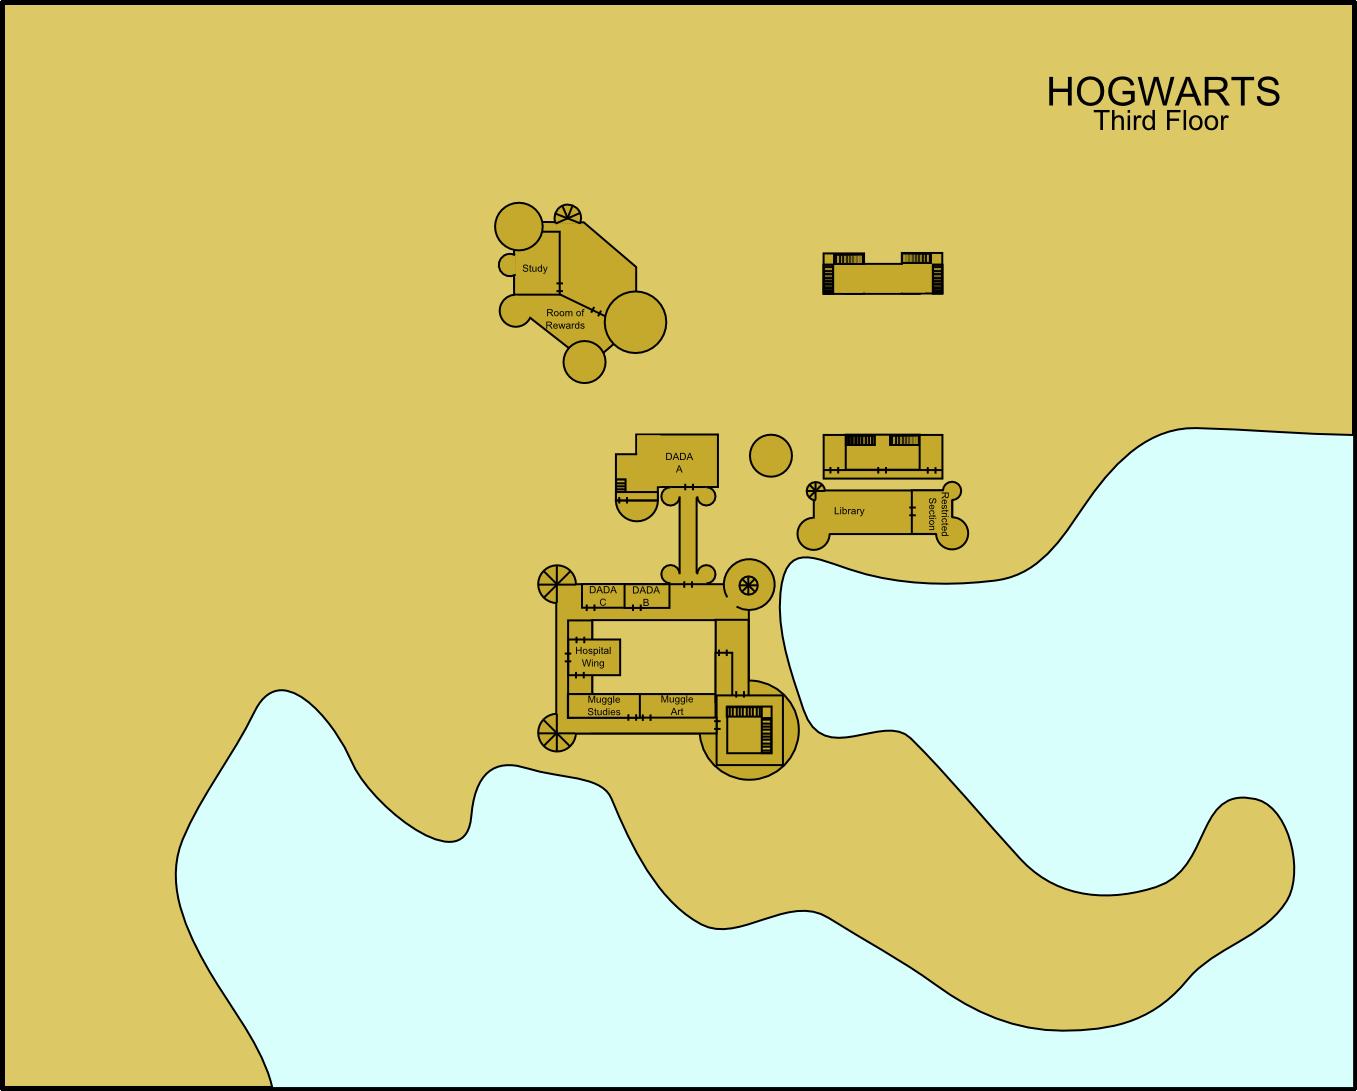 Hogwarts Third Floor